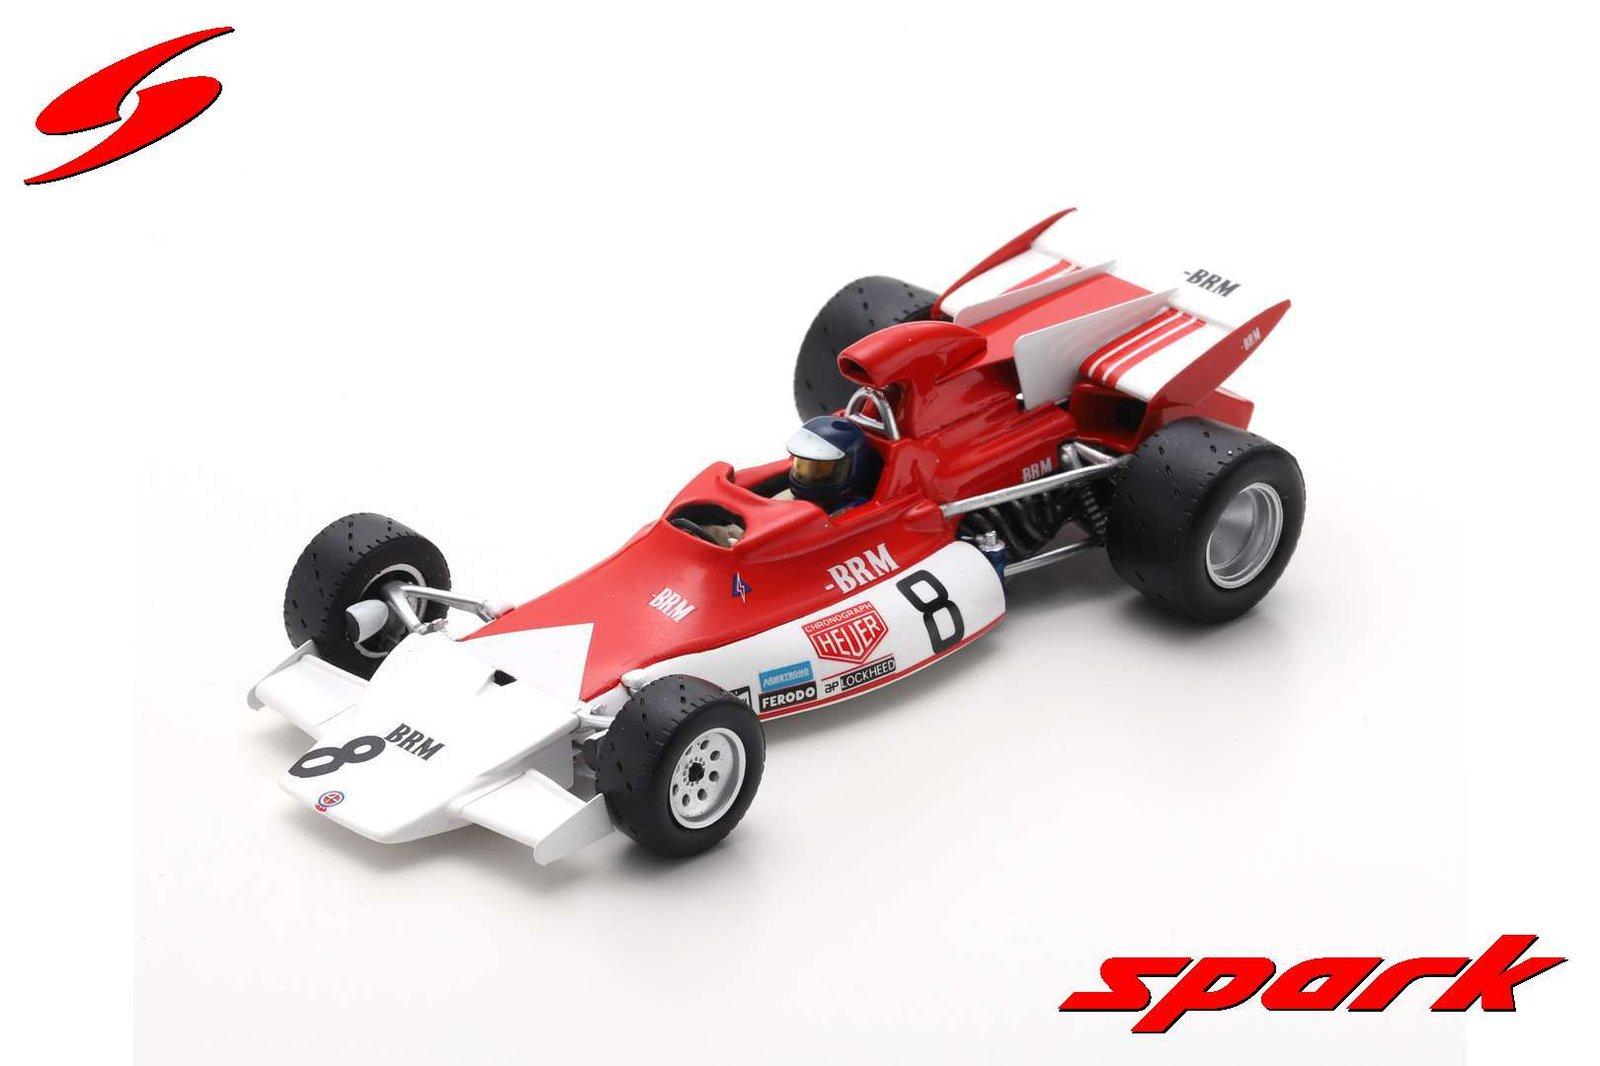 S5284-1